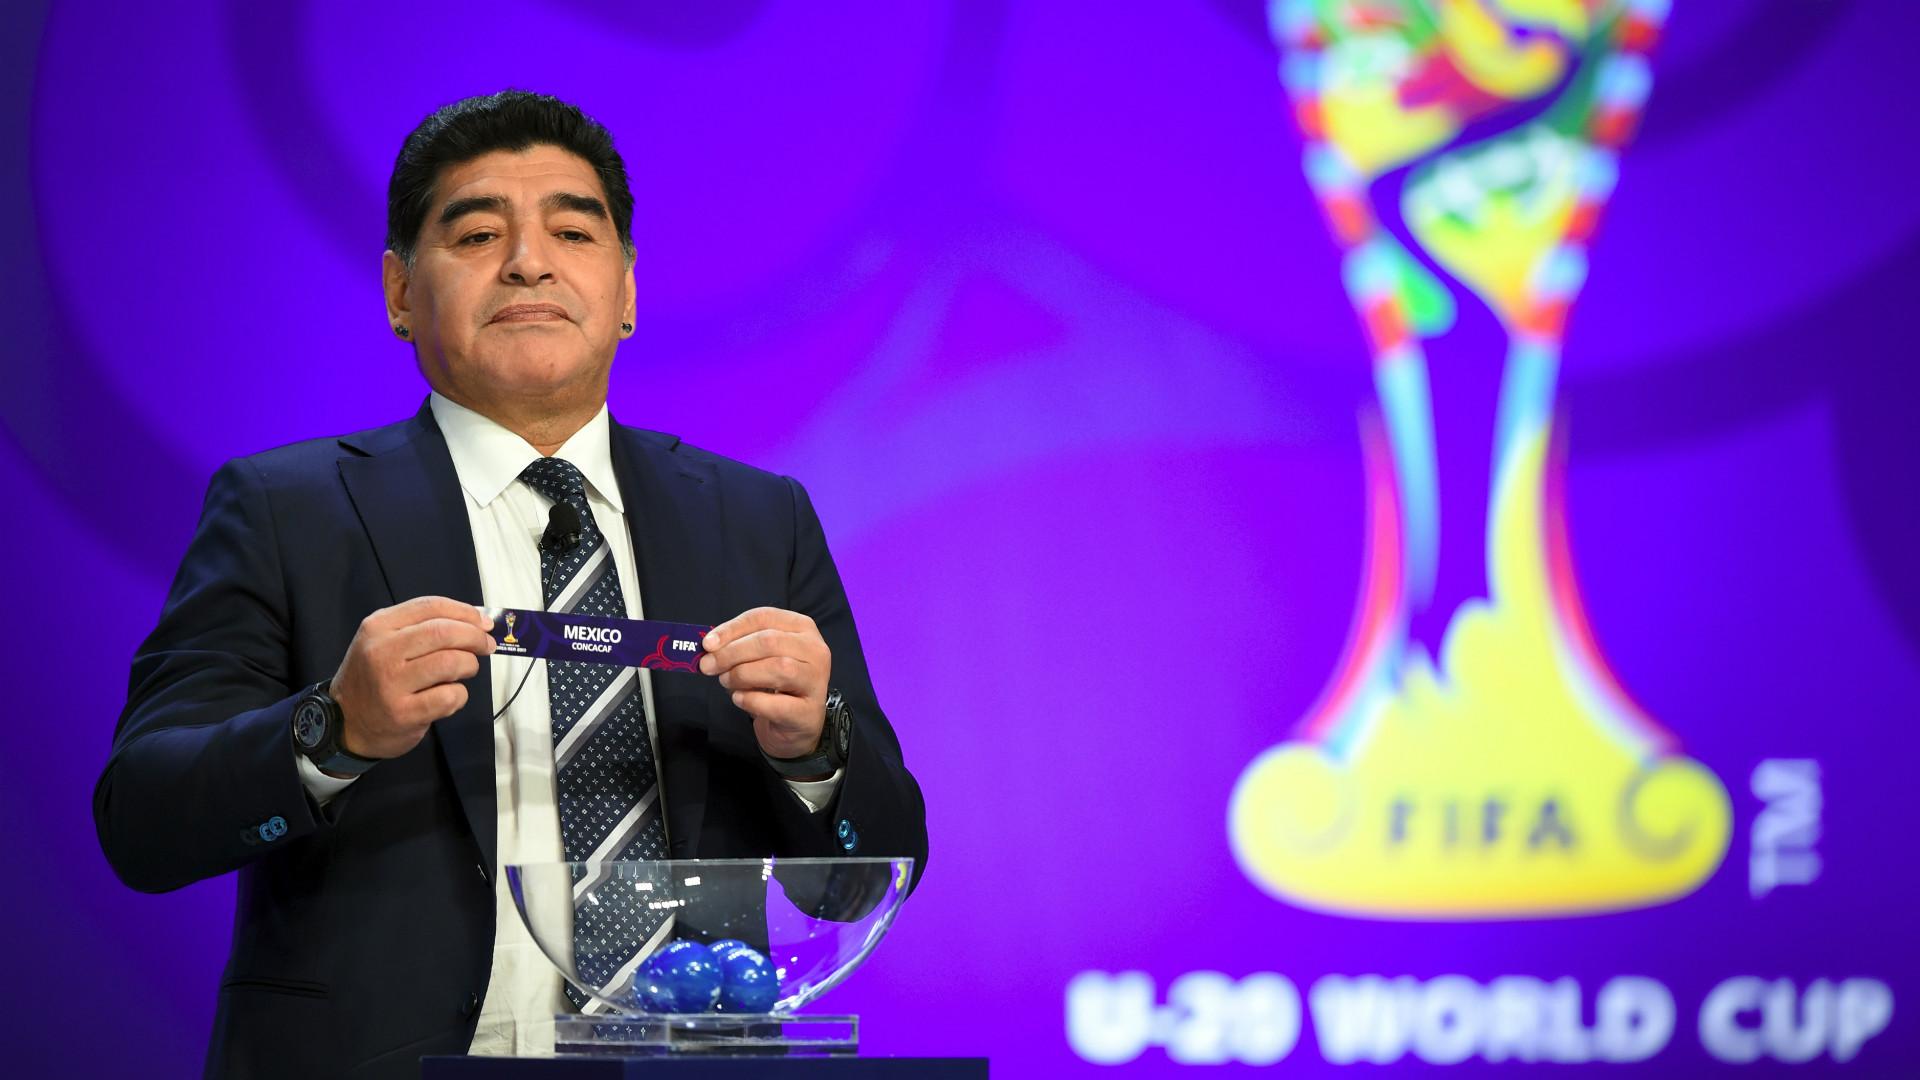 diego-maradona-world-cup-draw_ccef2wac2kch1qt8un3nruv2i